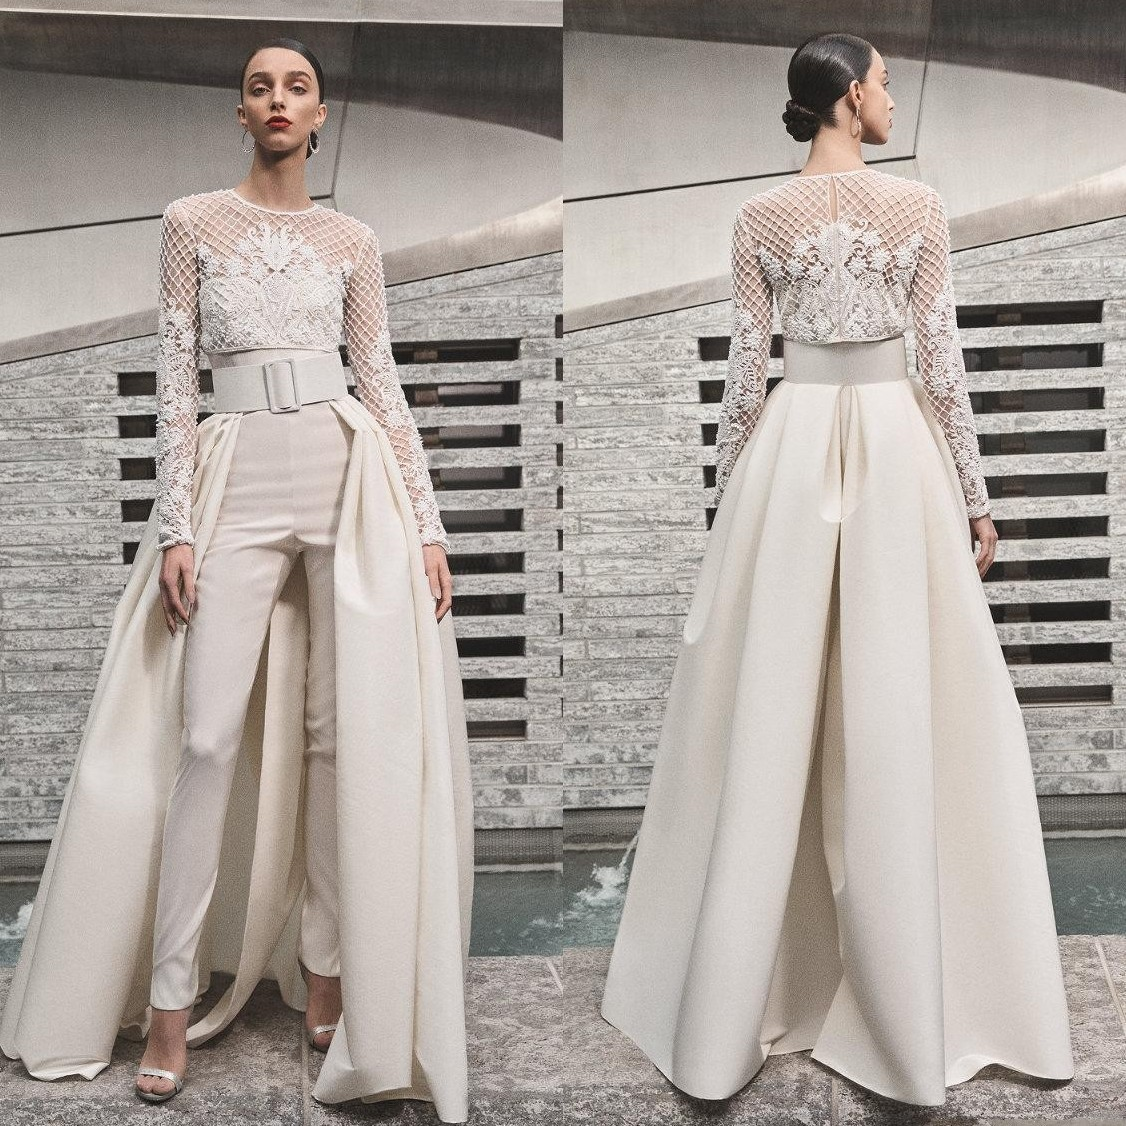 Promotion Satin Cherie Robe Simple Longue Vente Satin Cherie Robe Simple Longue 2020 Sur Fr Dhgate Com